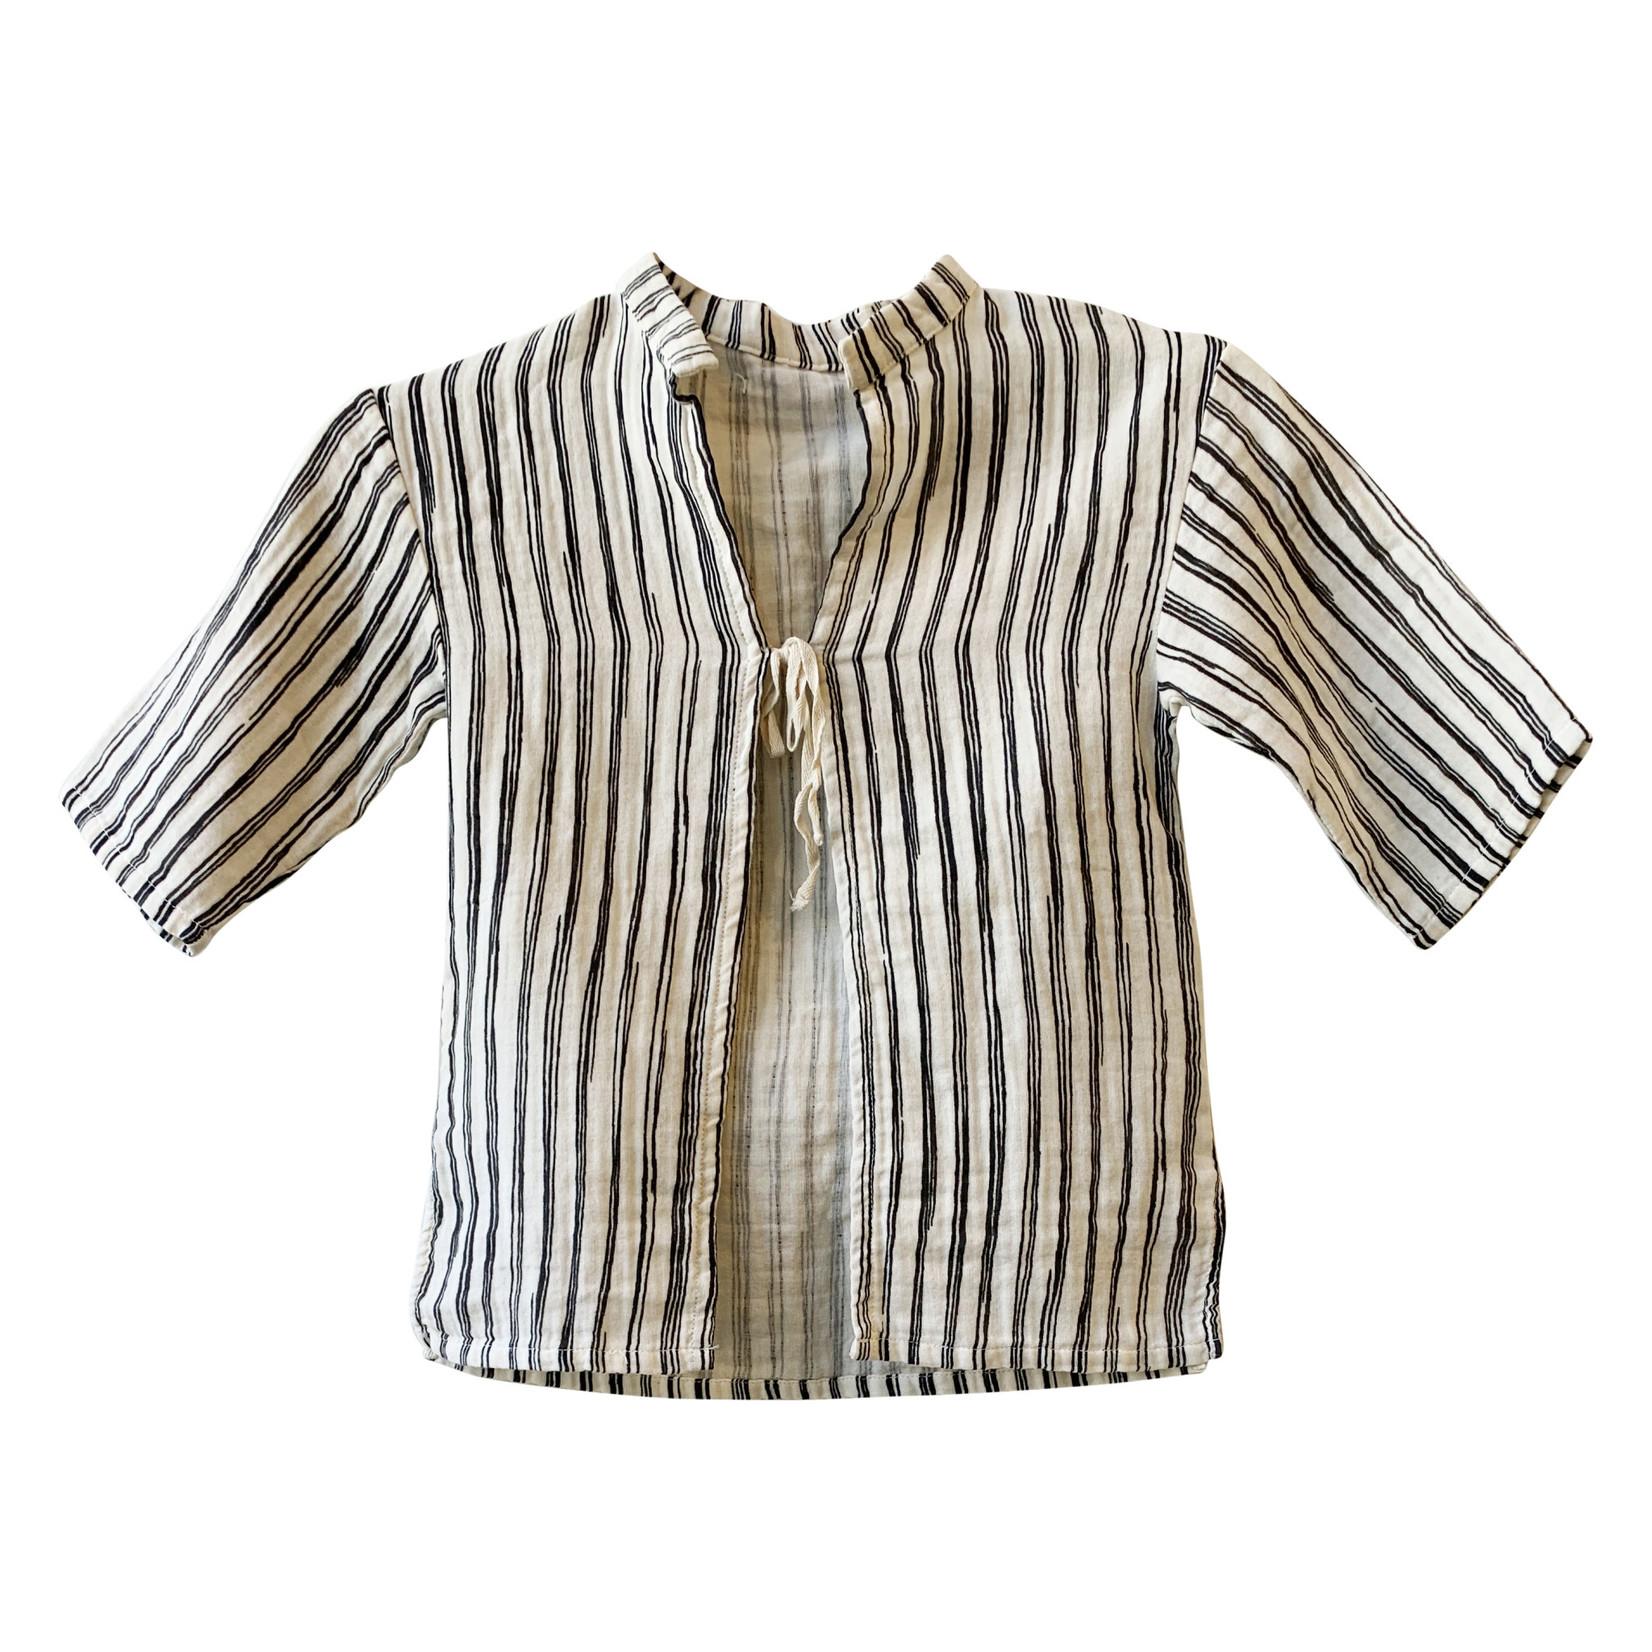 Little Creative Factory Bamboo Striped Long Sleeve Shirt